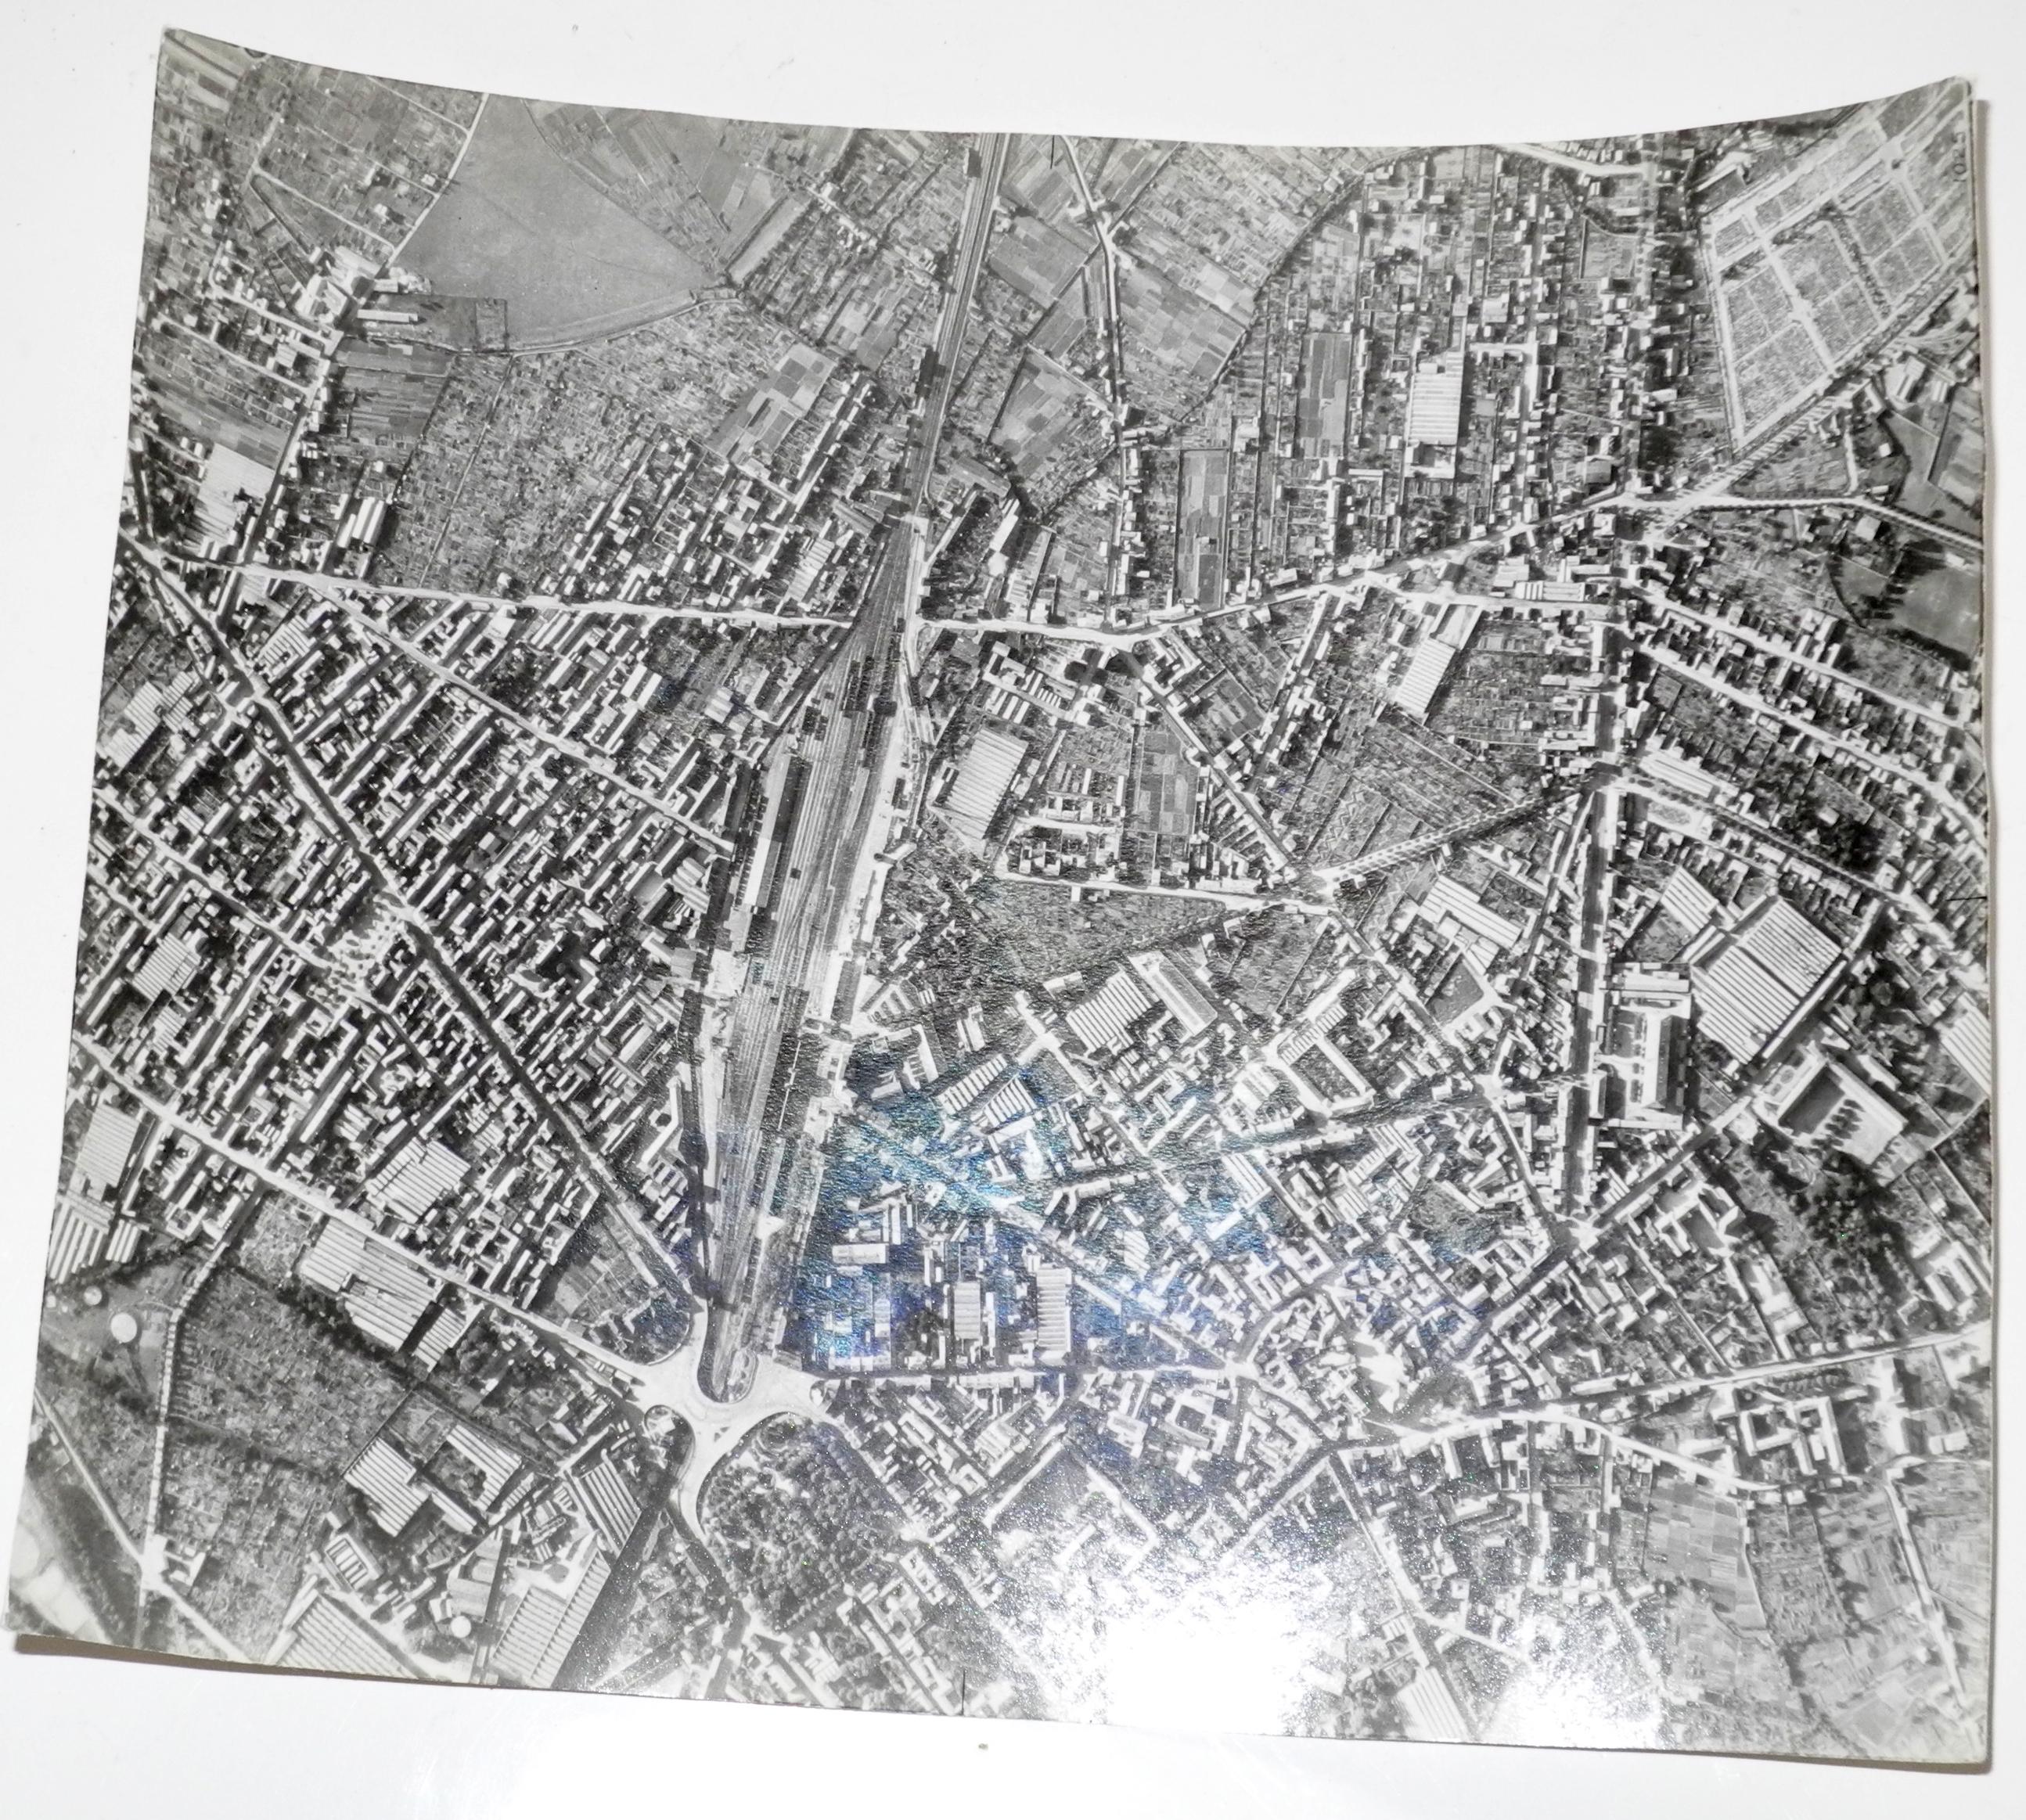 Large RAF Bomber / Reconnaissance target photo